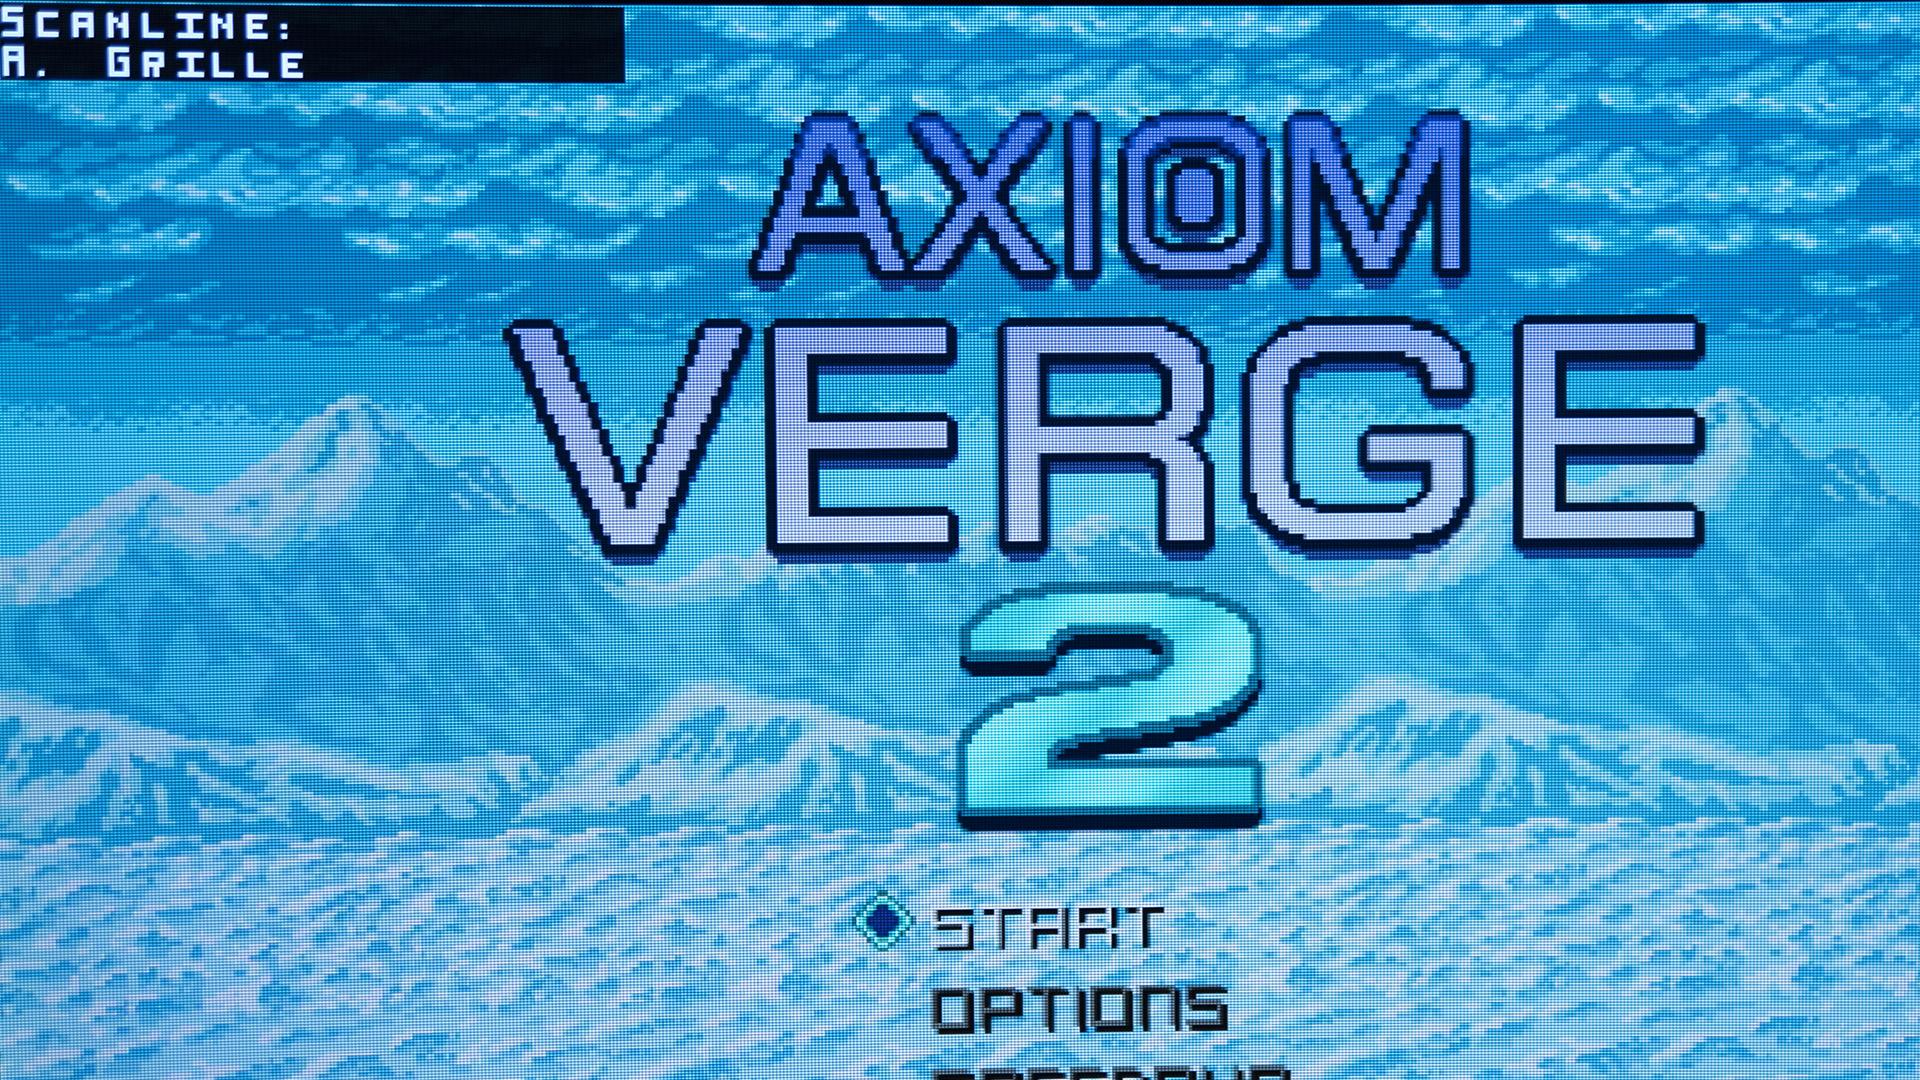 Axiom Verge 2 + RT5x Scanlines